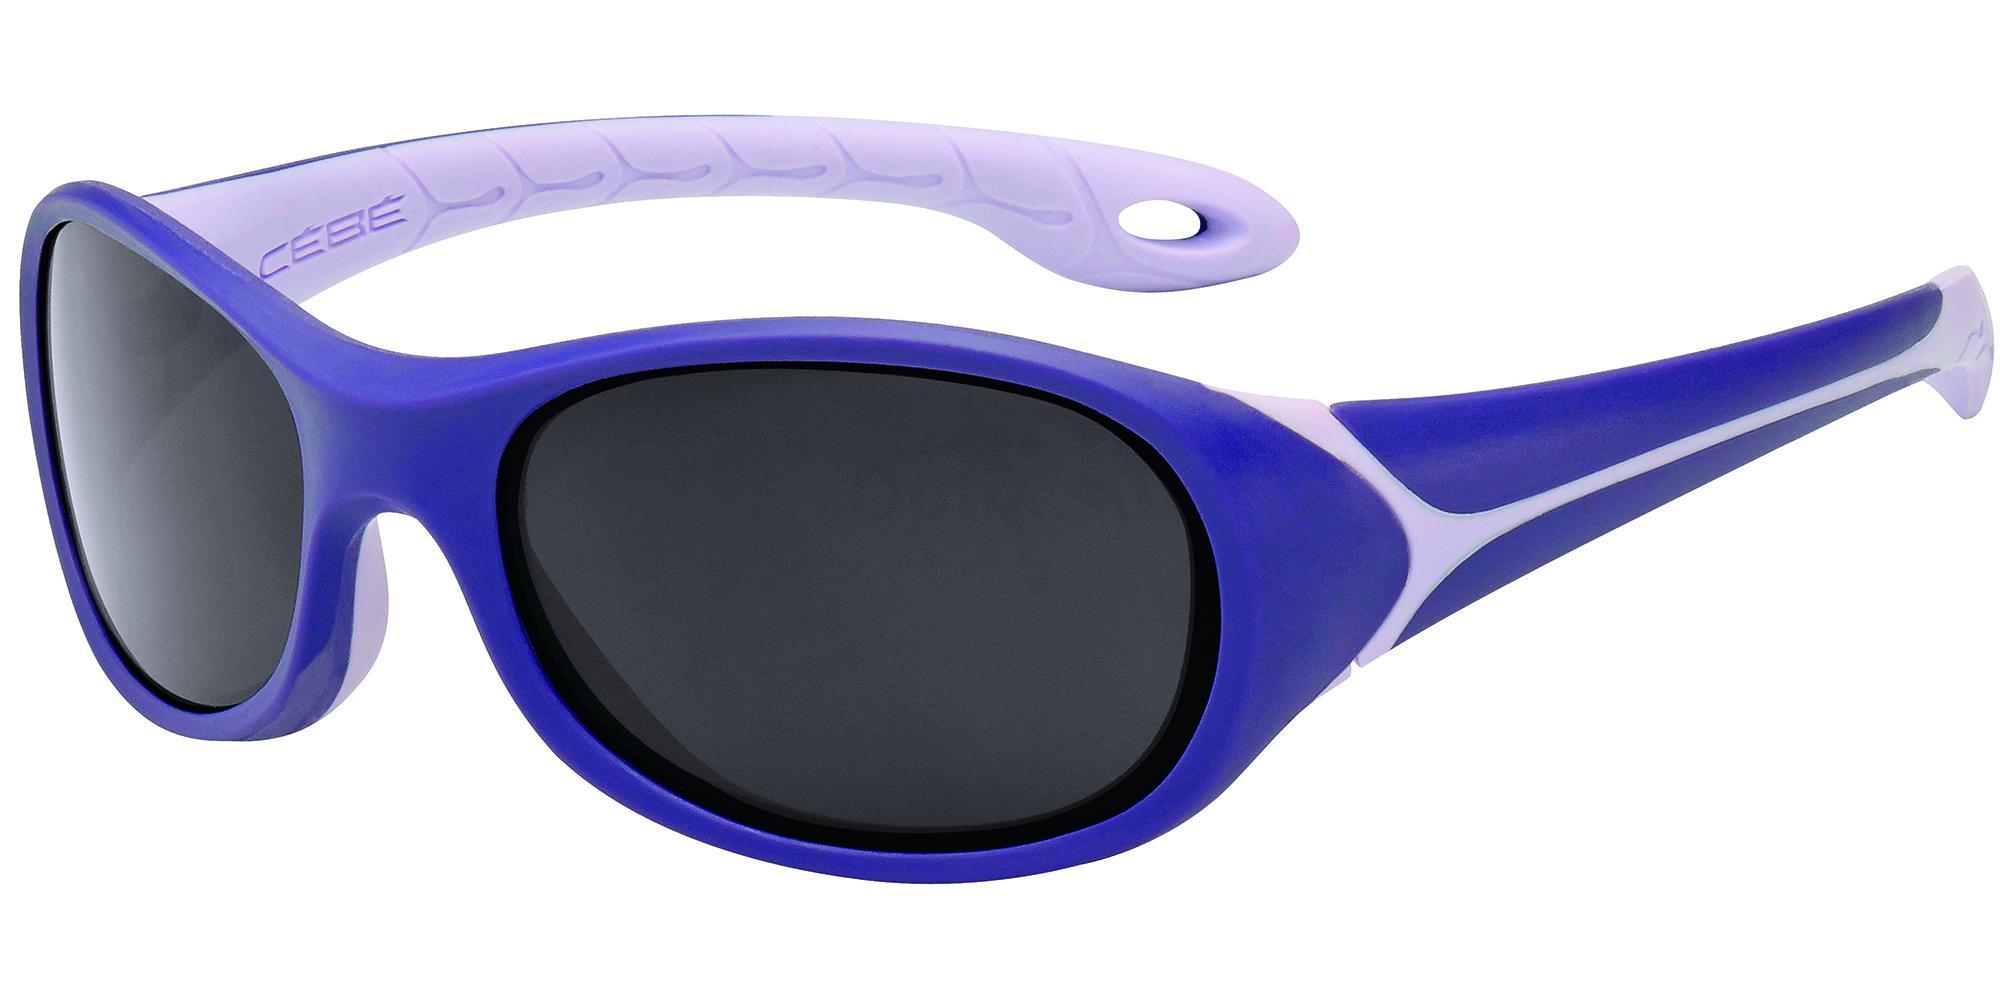 CBFLIP16 Flipper (Age 3-5) Sunglasses, Cebe JUNIOR